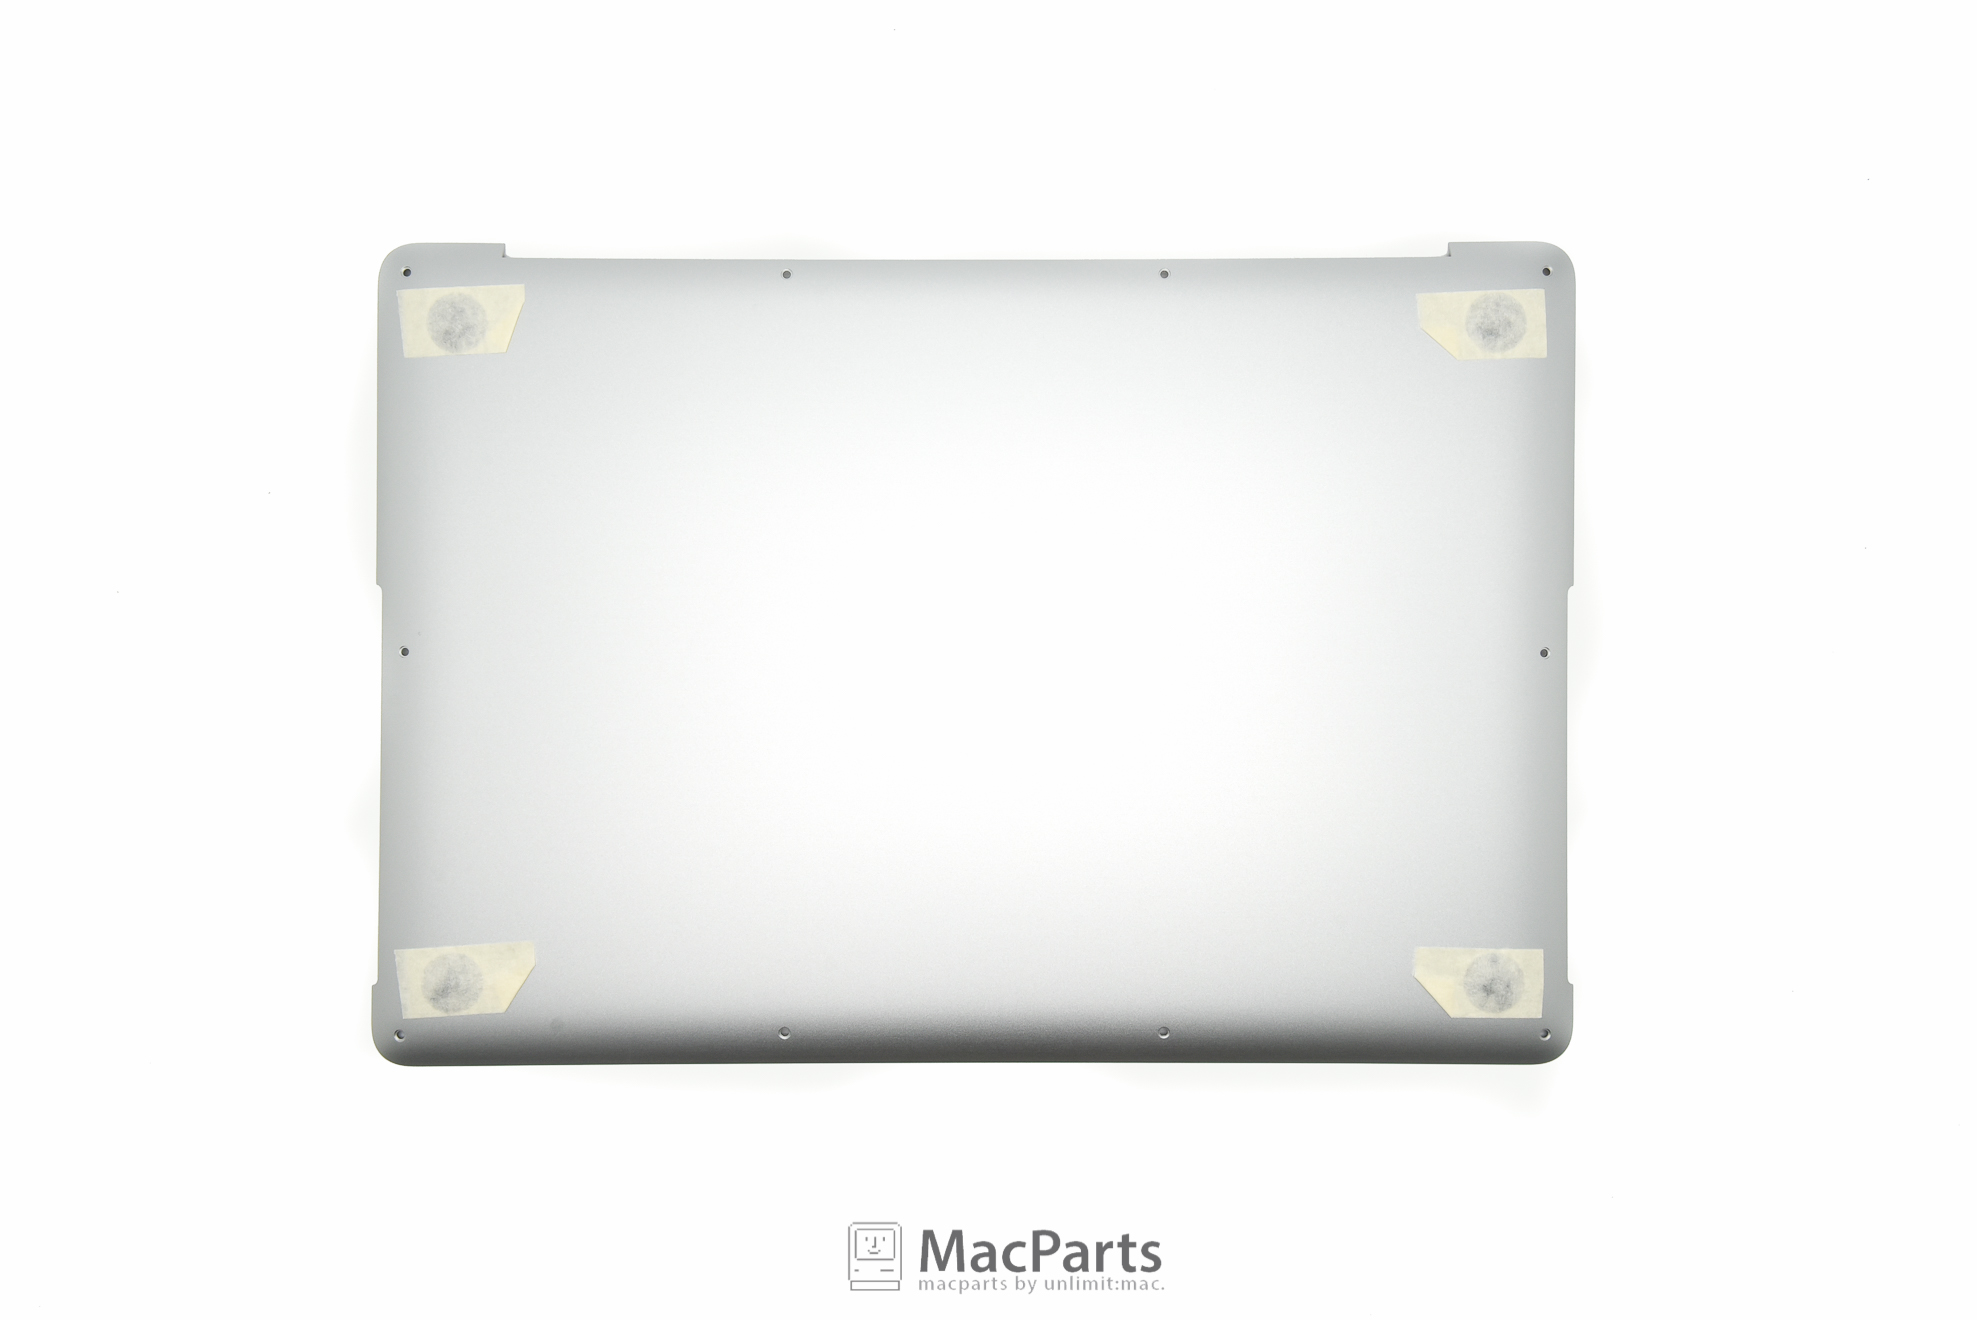 "923-0670 ENCL,BOTTOM CASE,IG,15""MBP RETINA MacBook Pro (Retina, 15-inch, Late 2013)"